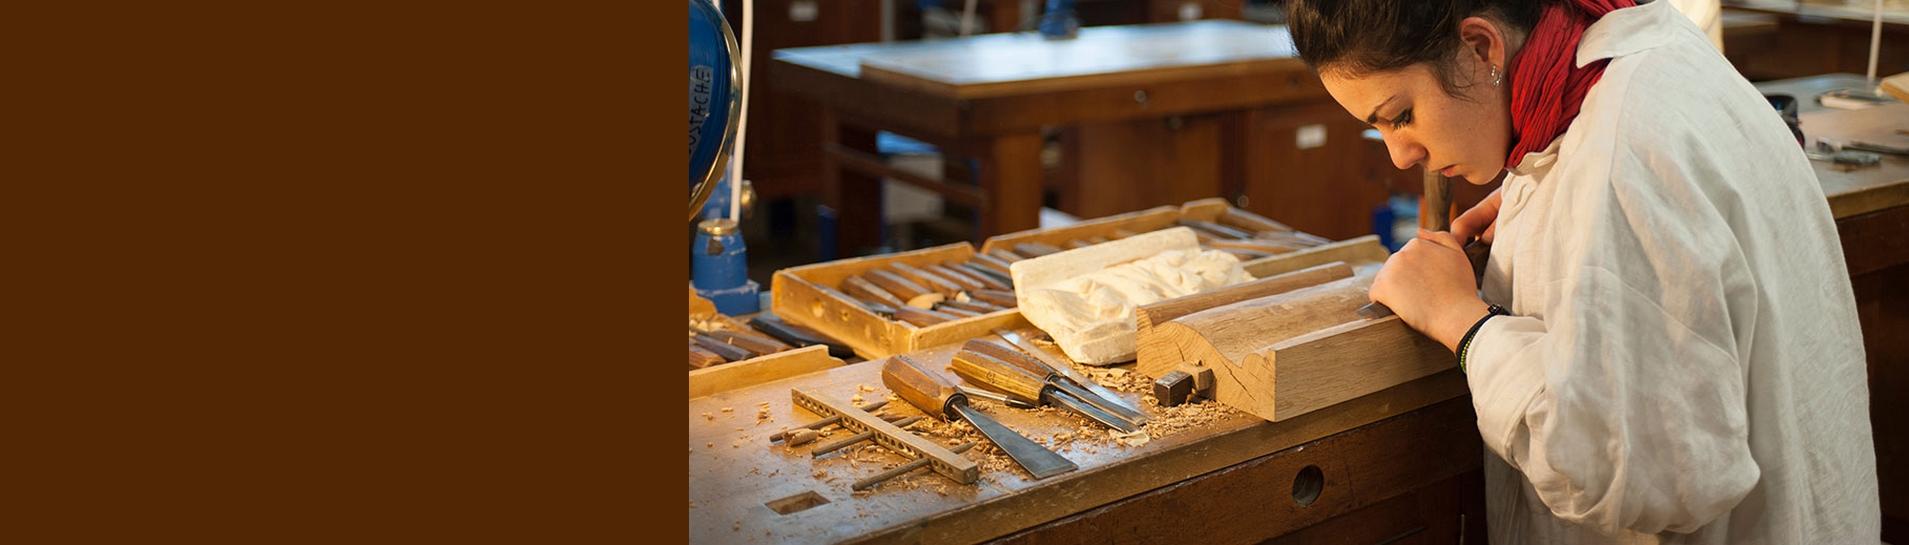 Formation Menuiserie D Art greta cdma - formations en arts du bois